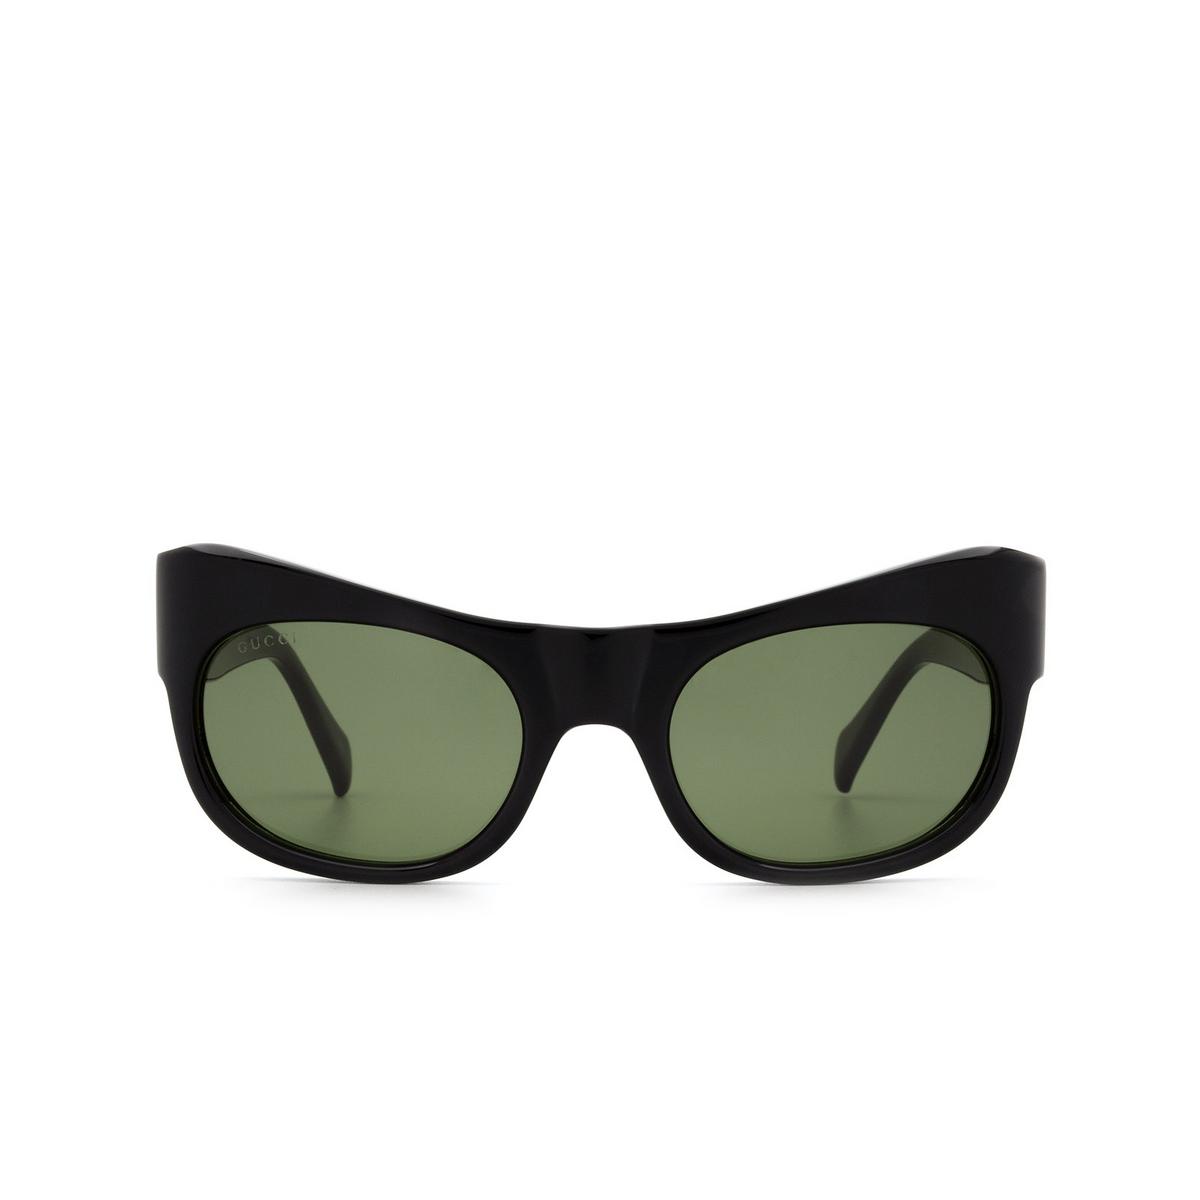 Gucci® Irregular Sunglasses: GG0870S color Black 001 - 1/3.